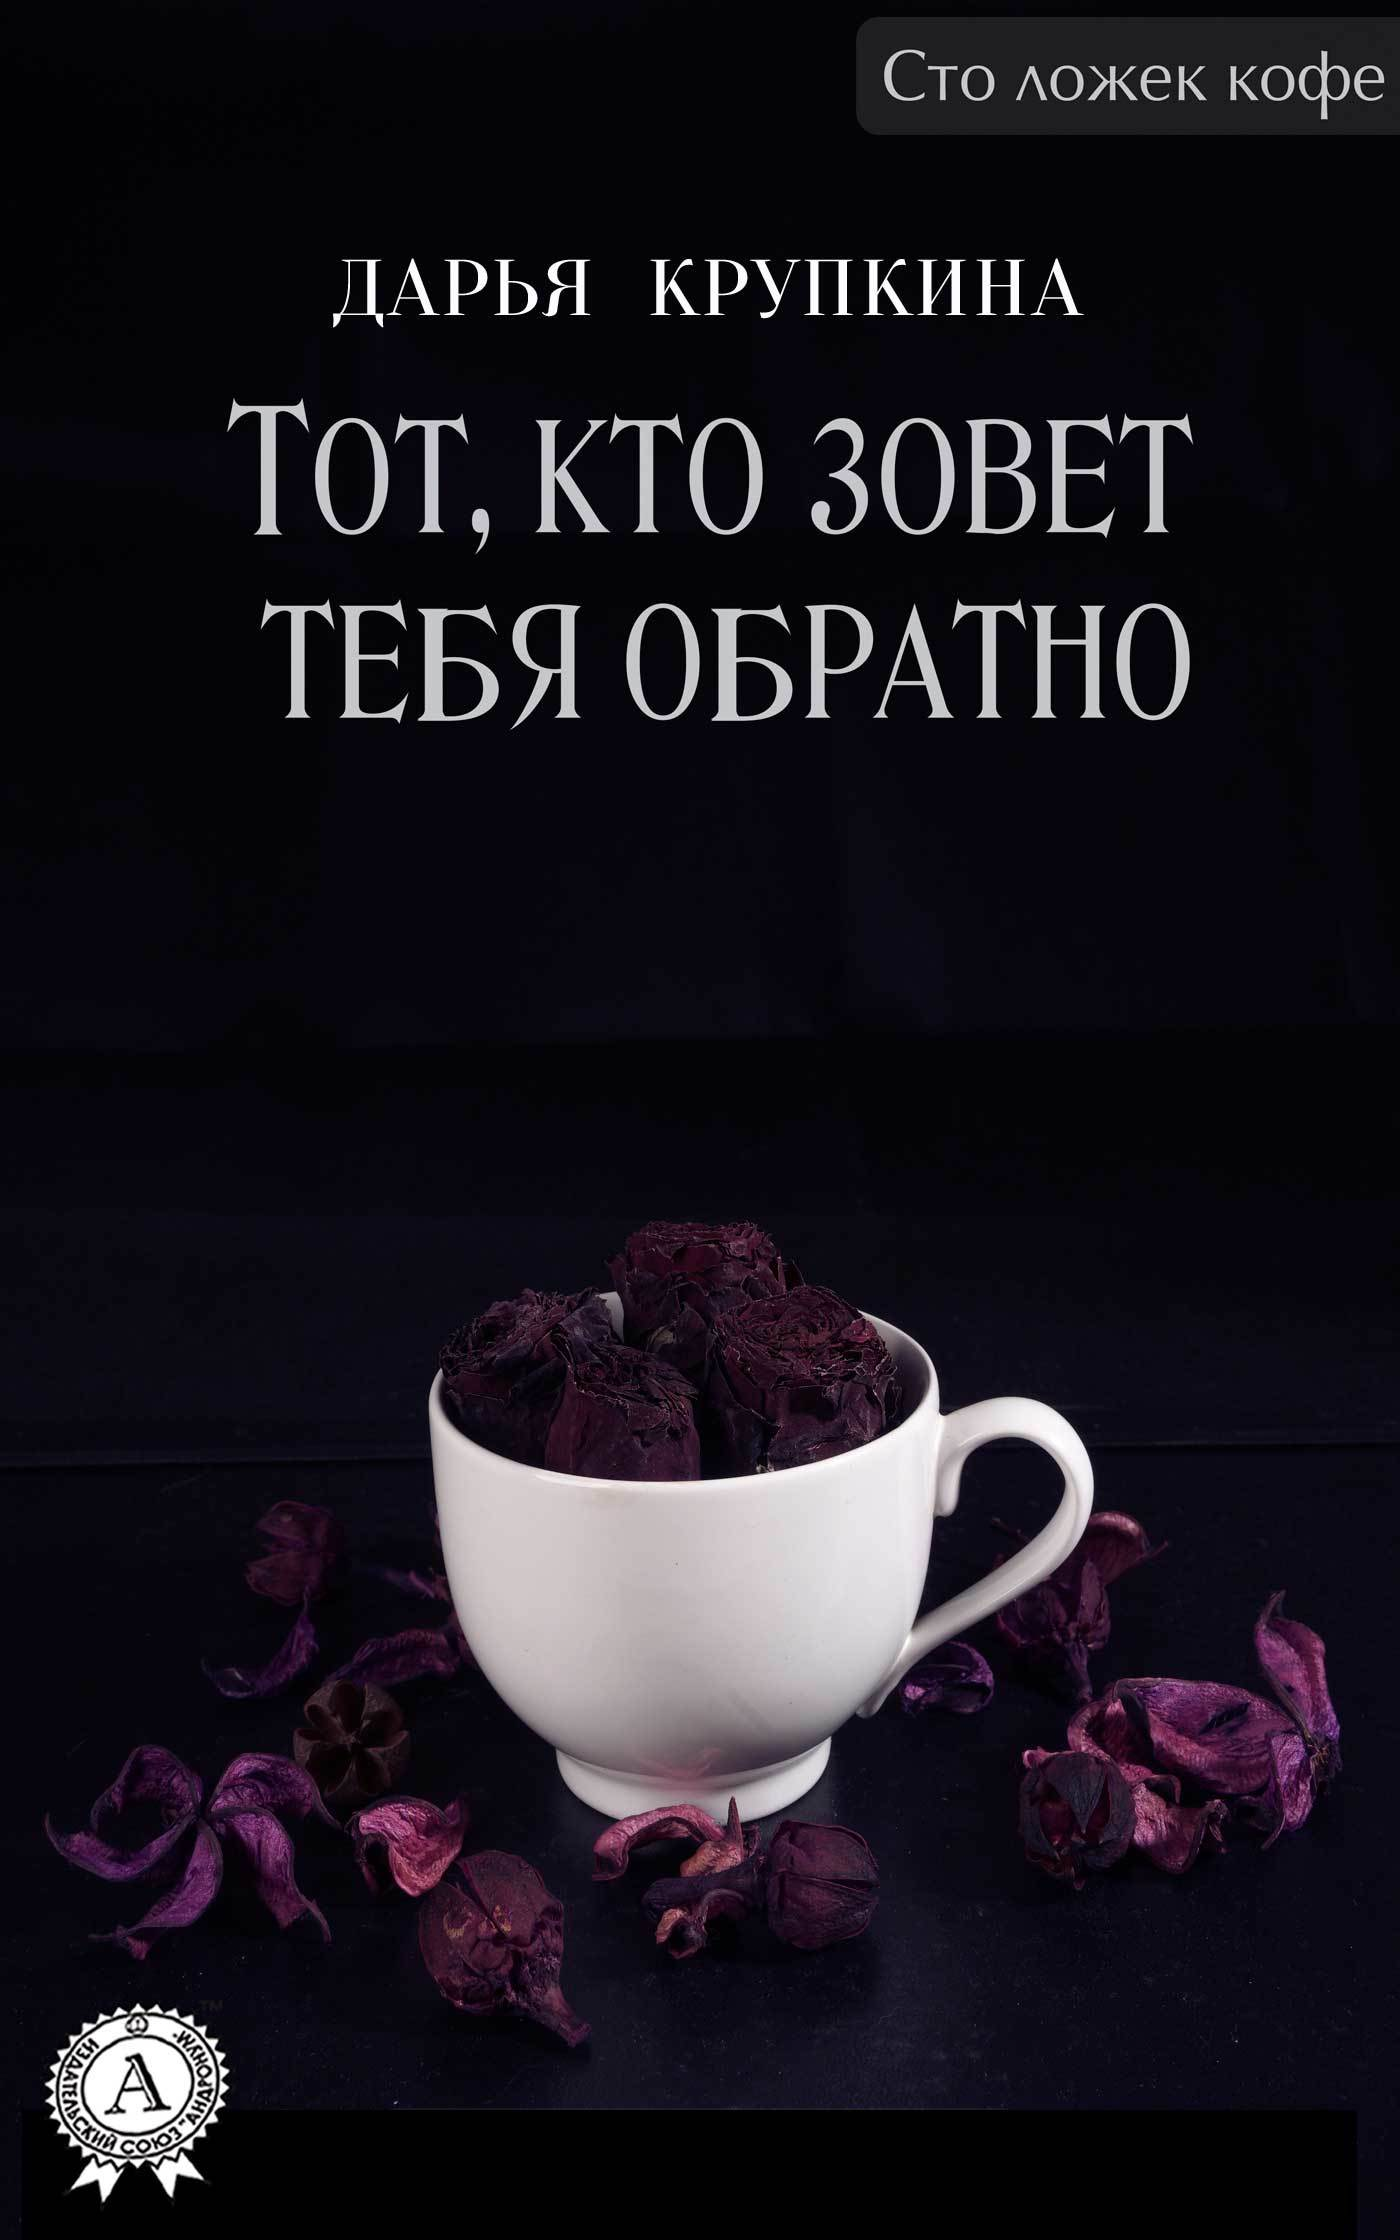 Дарья Крупкина бесплатно